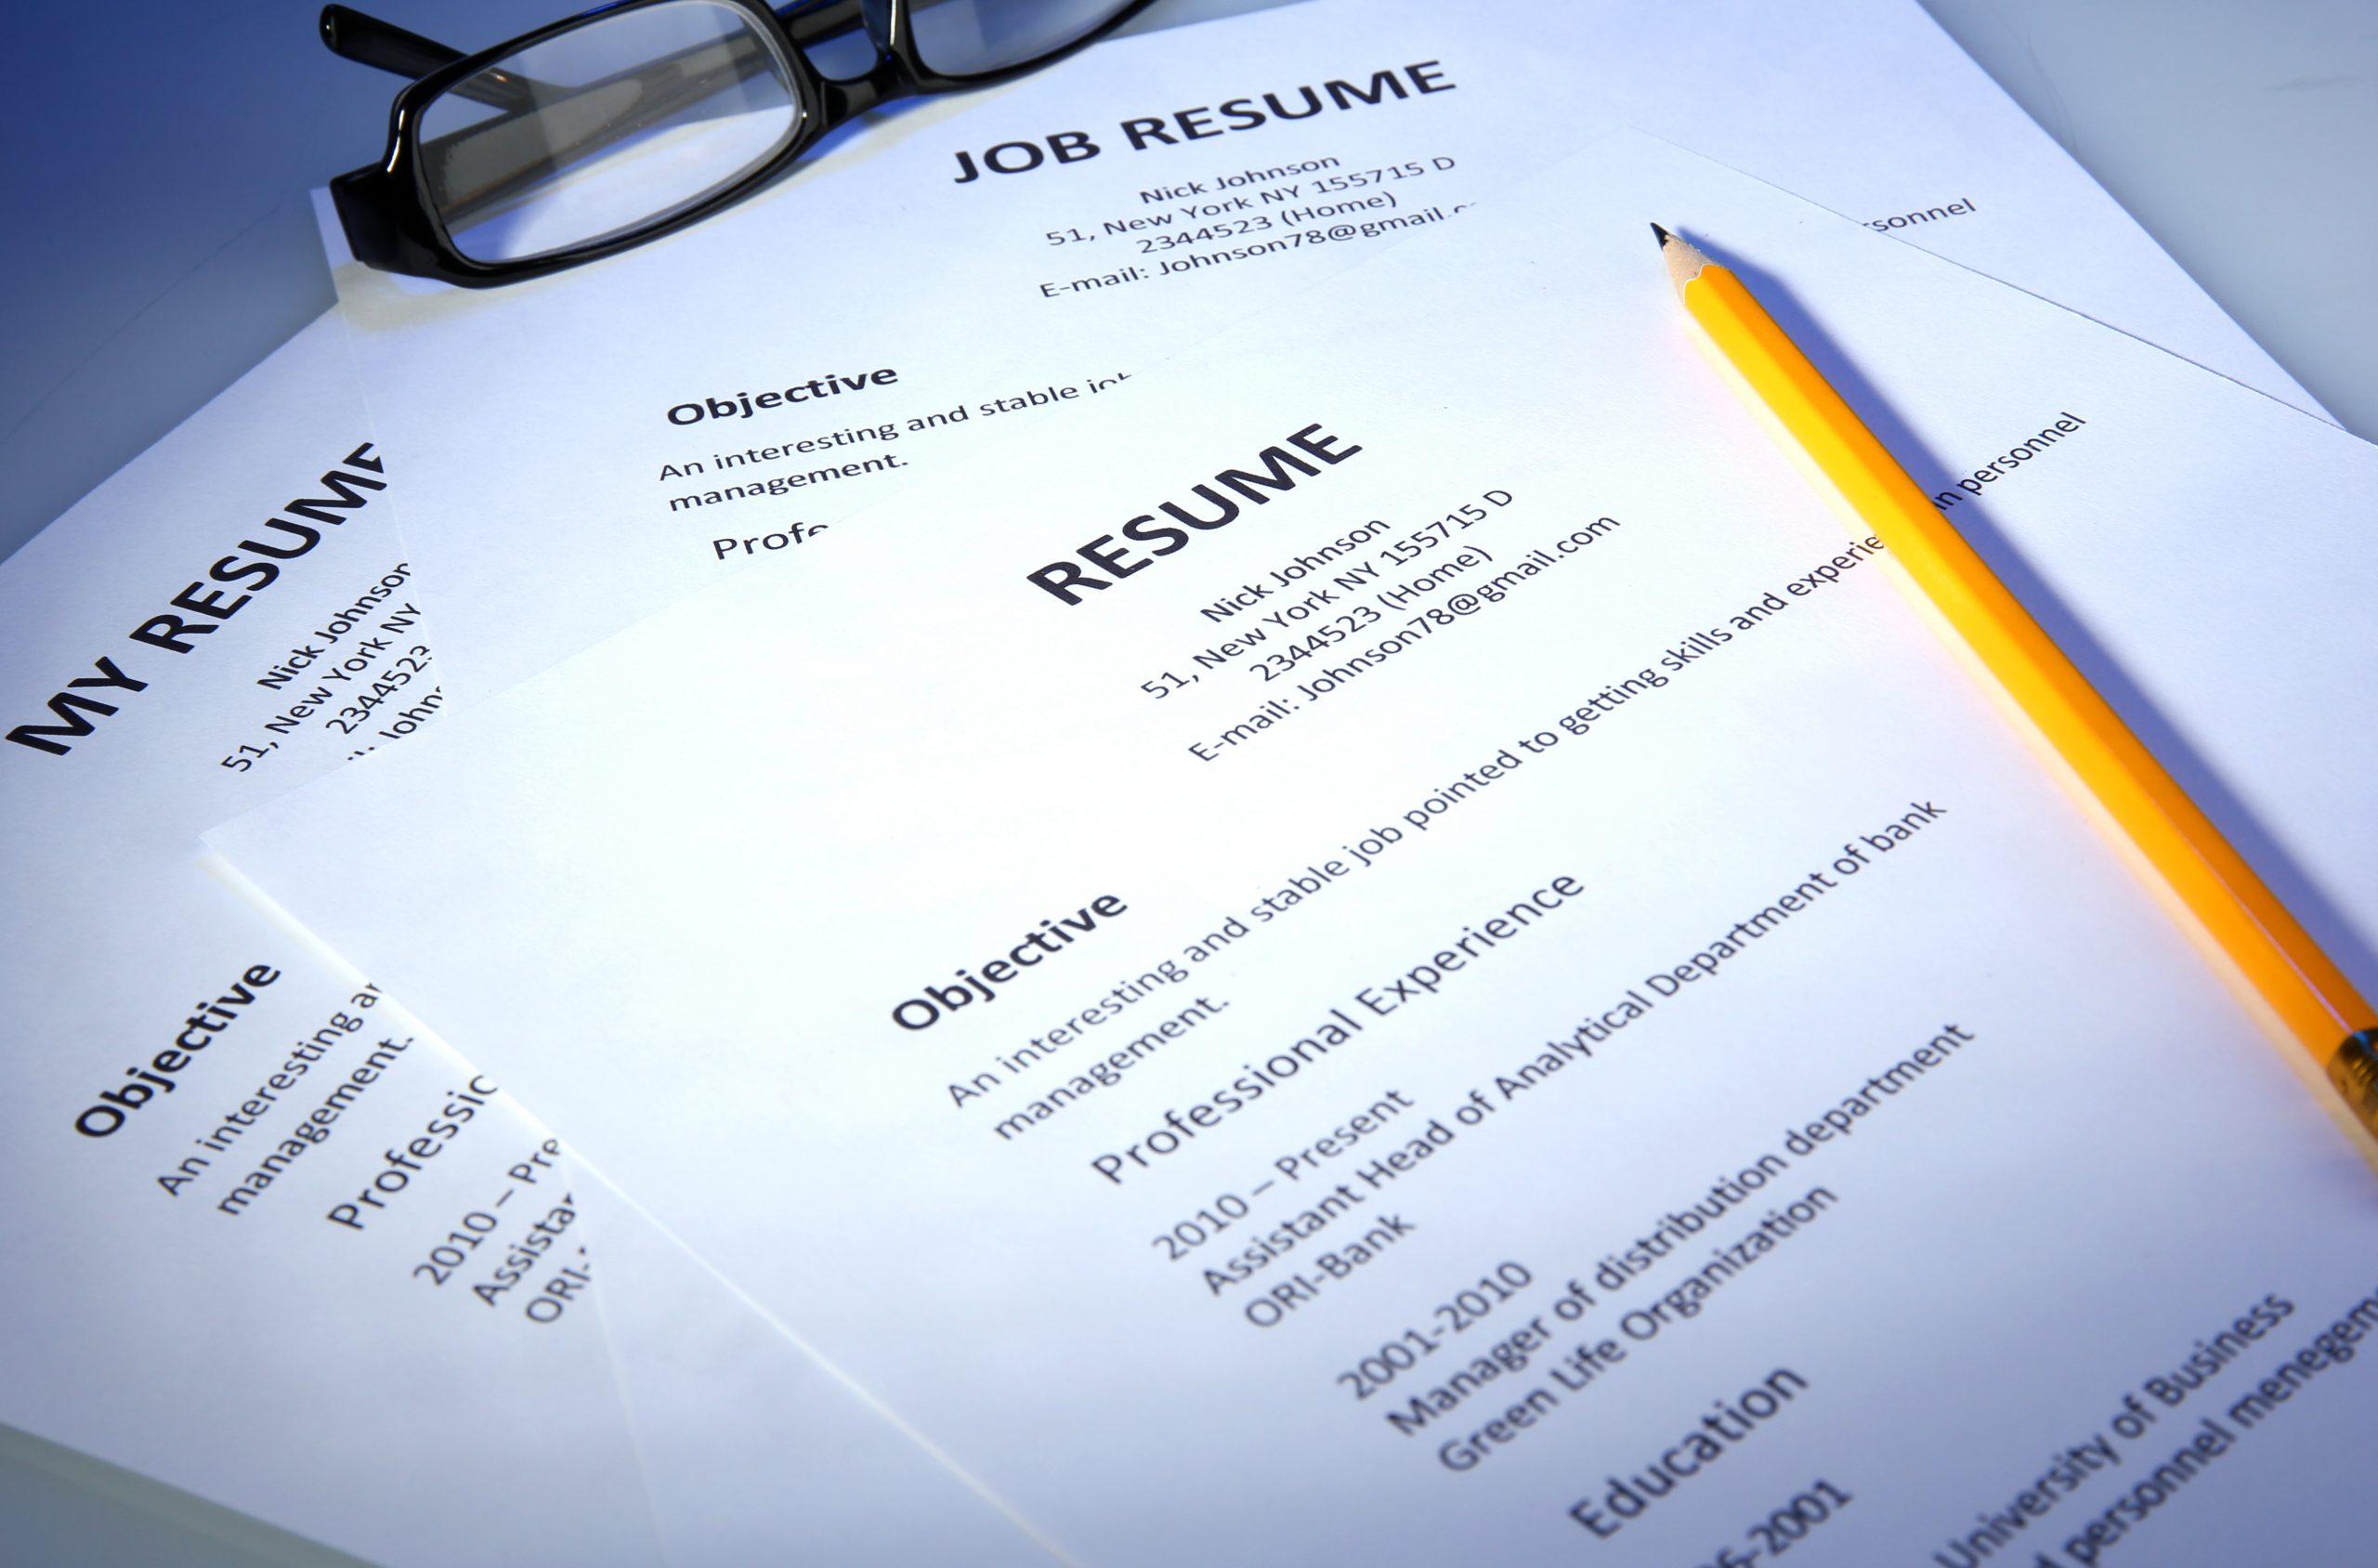 https://depositphotos.com/13211722/stock-photo-closeup-of-resume-with-glasses.html